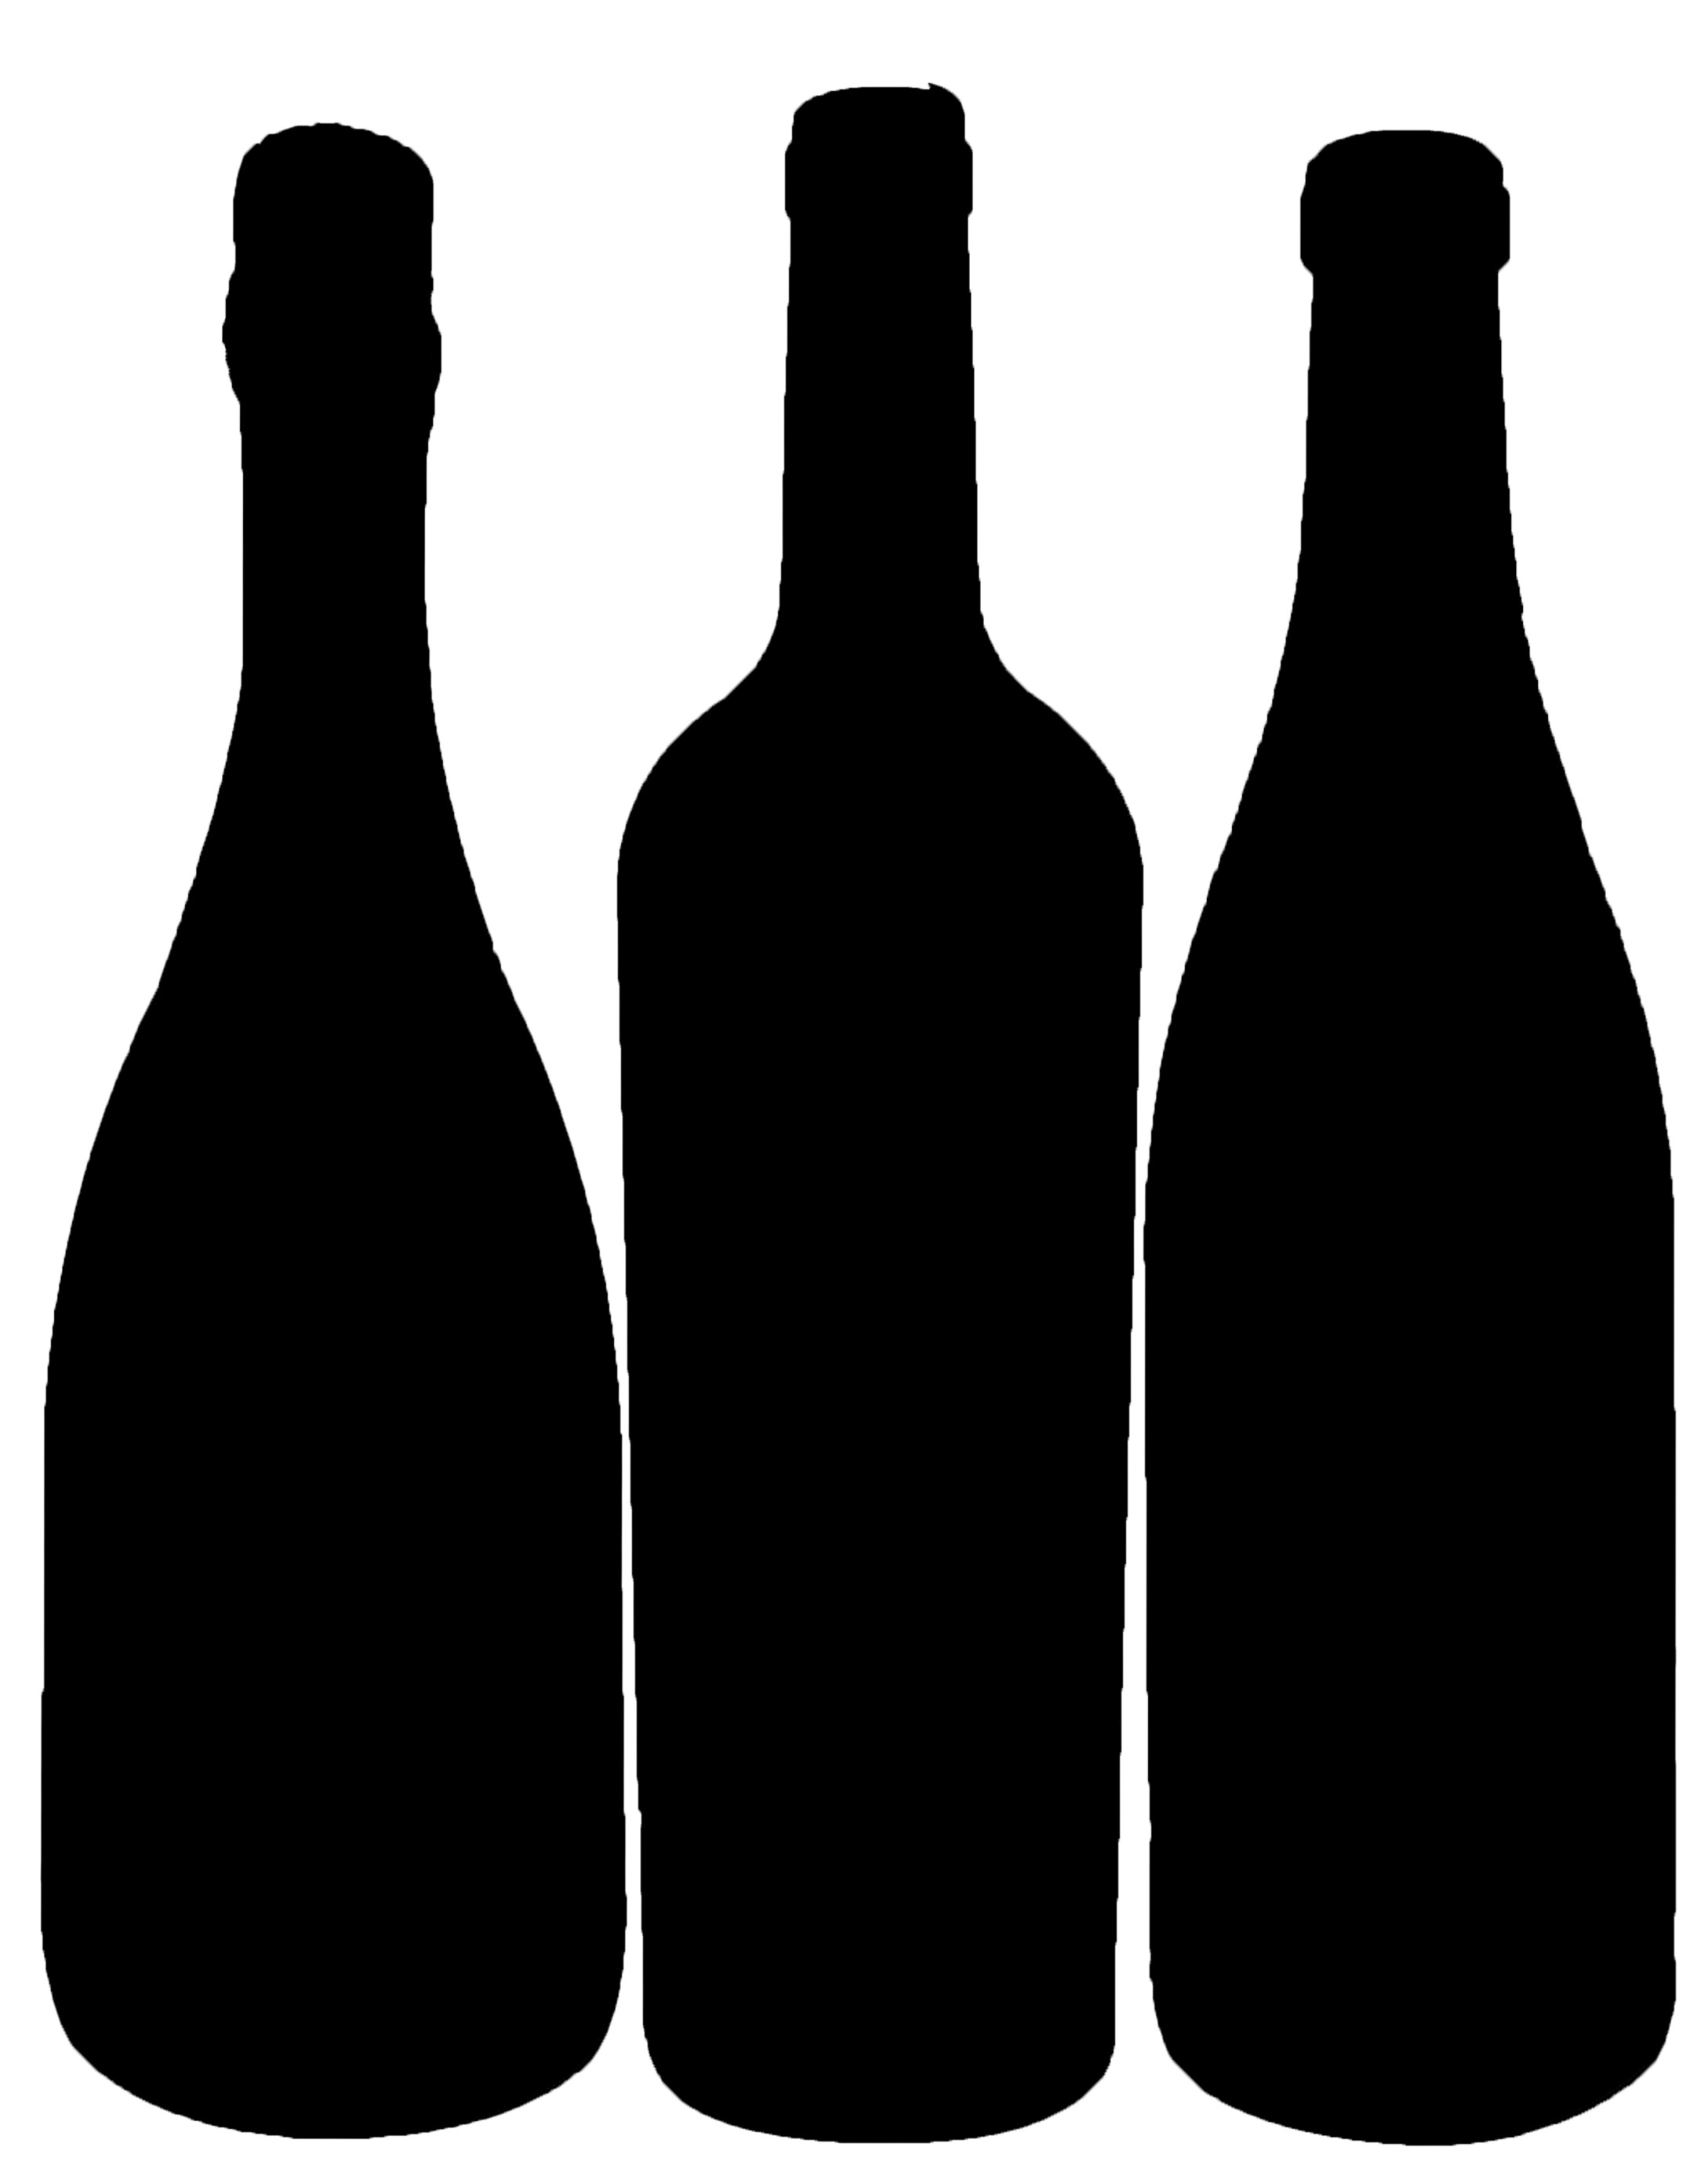 Wine bottle clipart black clip art royalty free Liquor Bottle Cliparts | Free download best Liquor Bottle Cliparts ... clip art royalty free